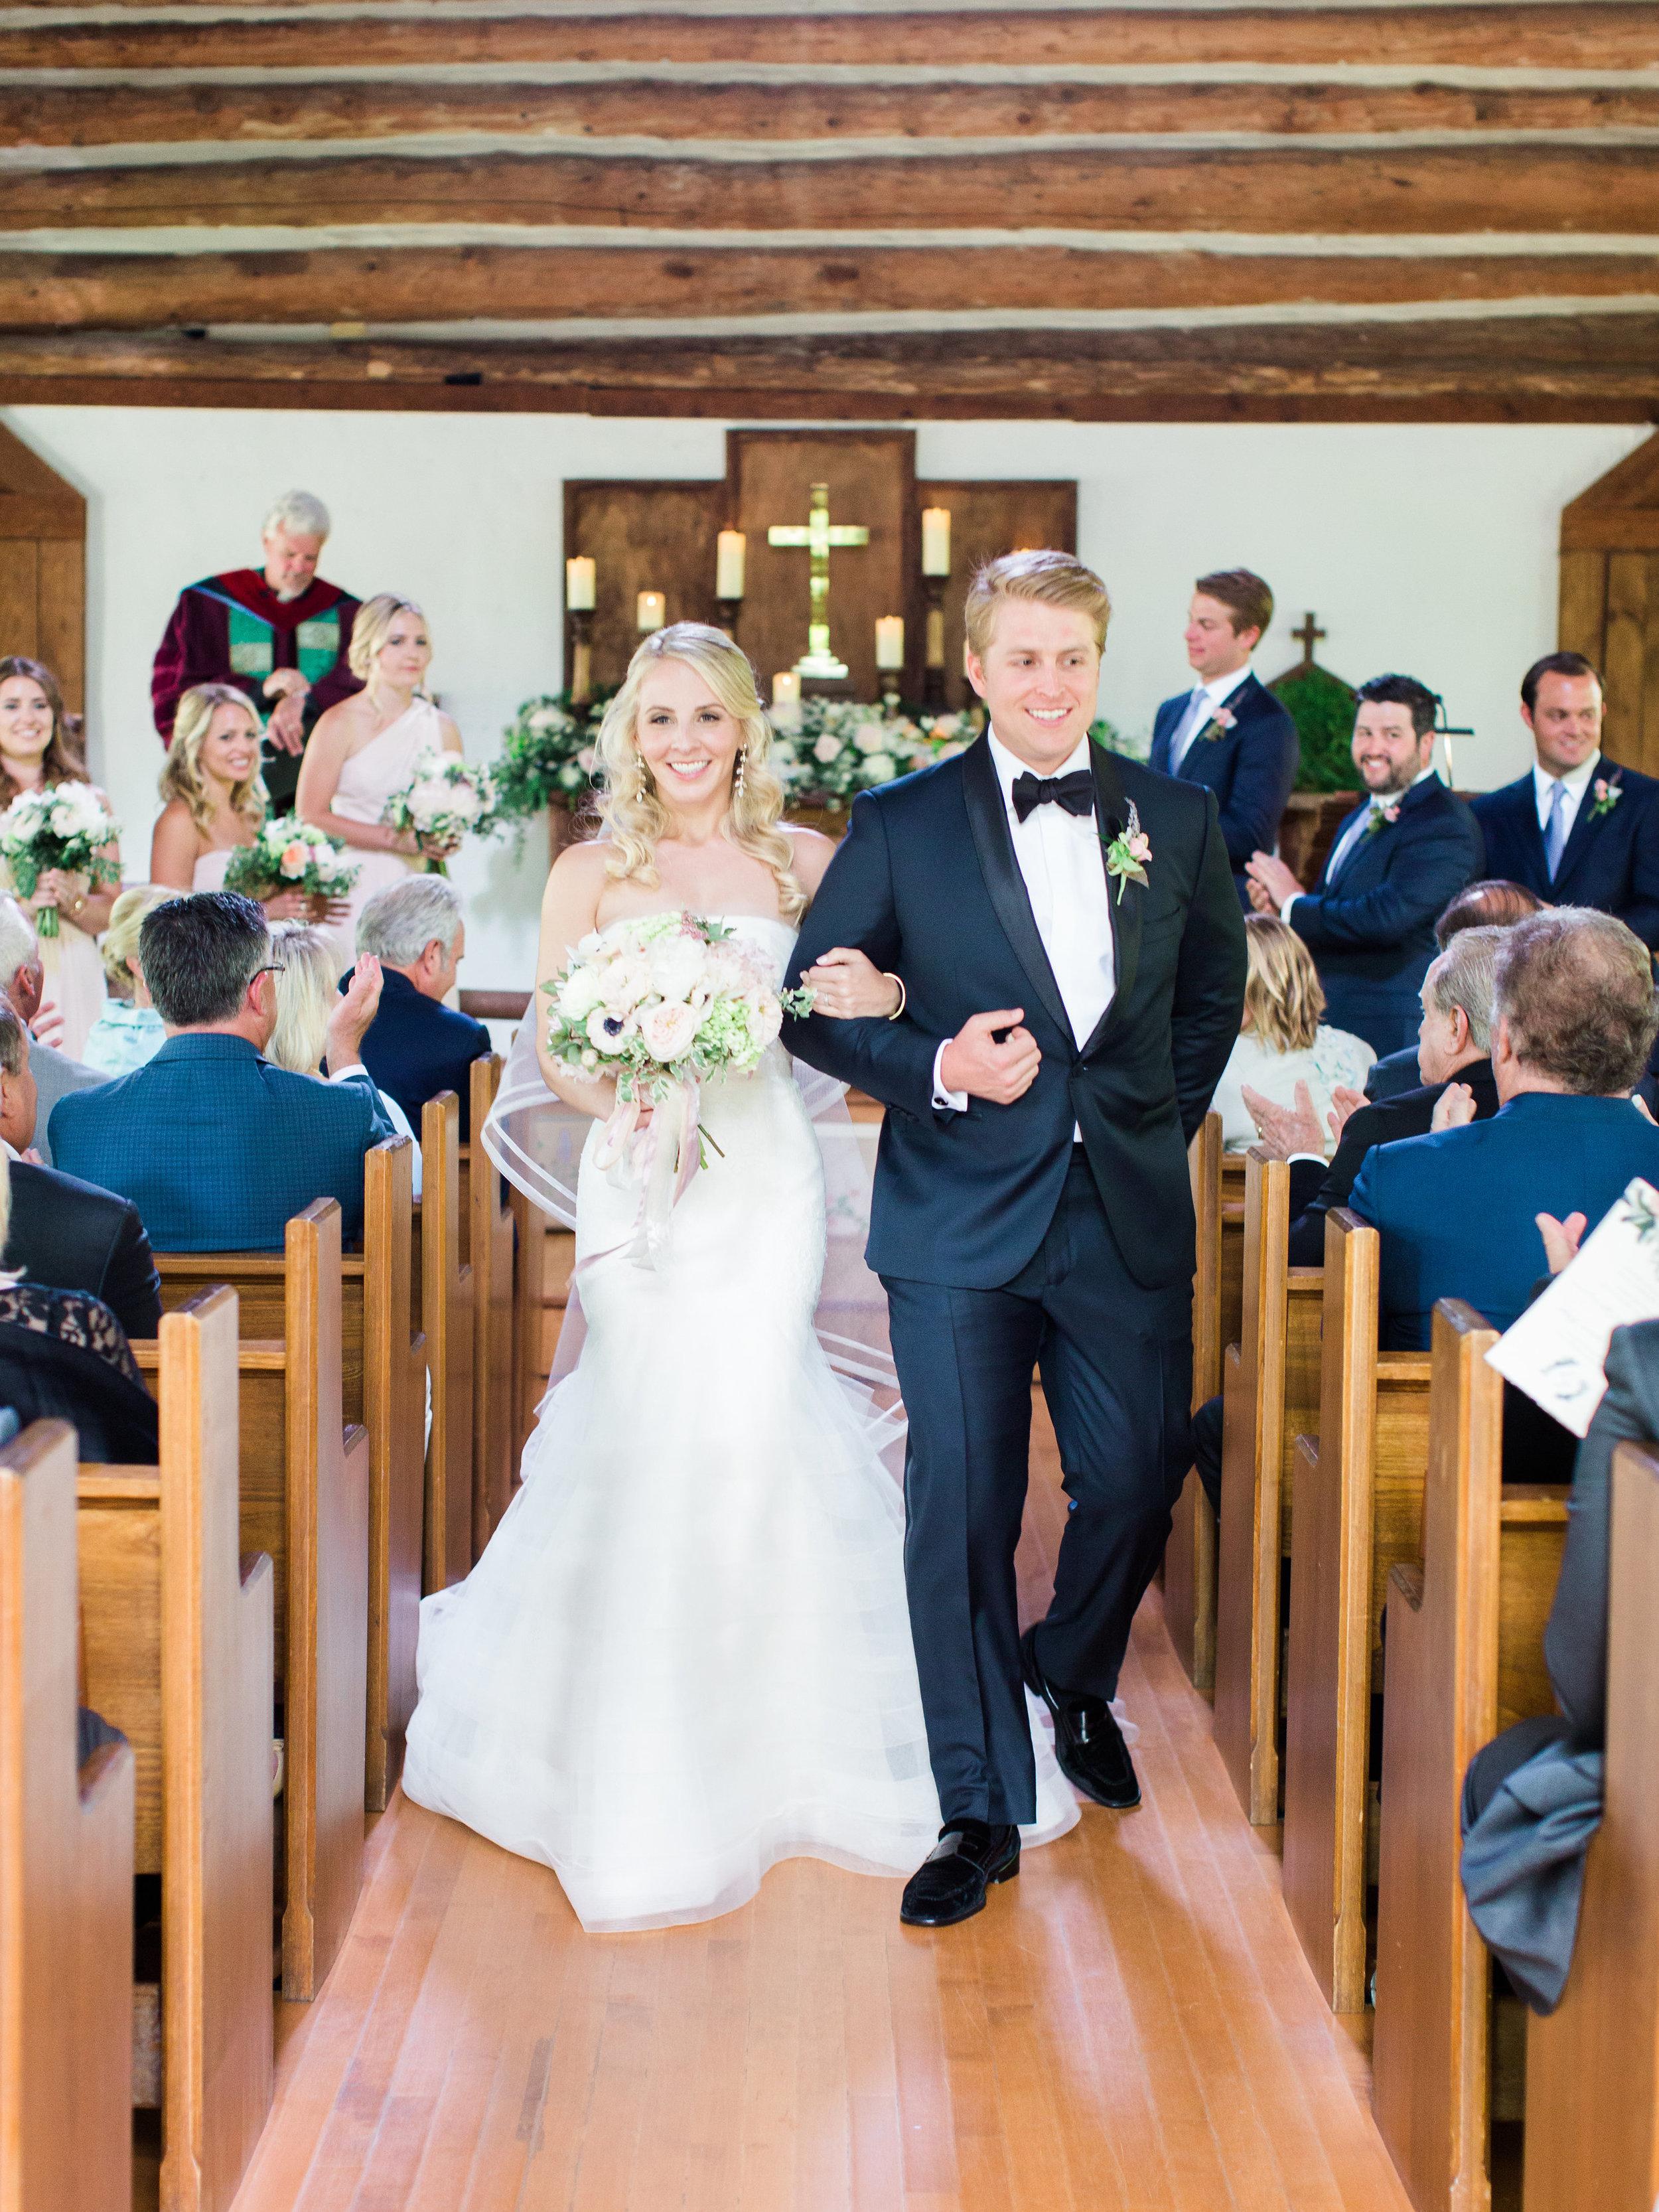 Coffman+Wedding+Ceremony-133.jpg